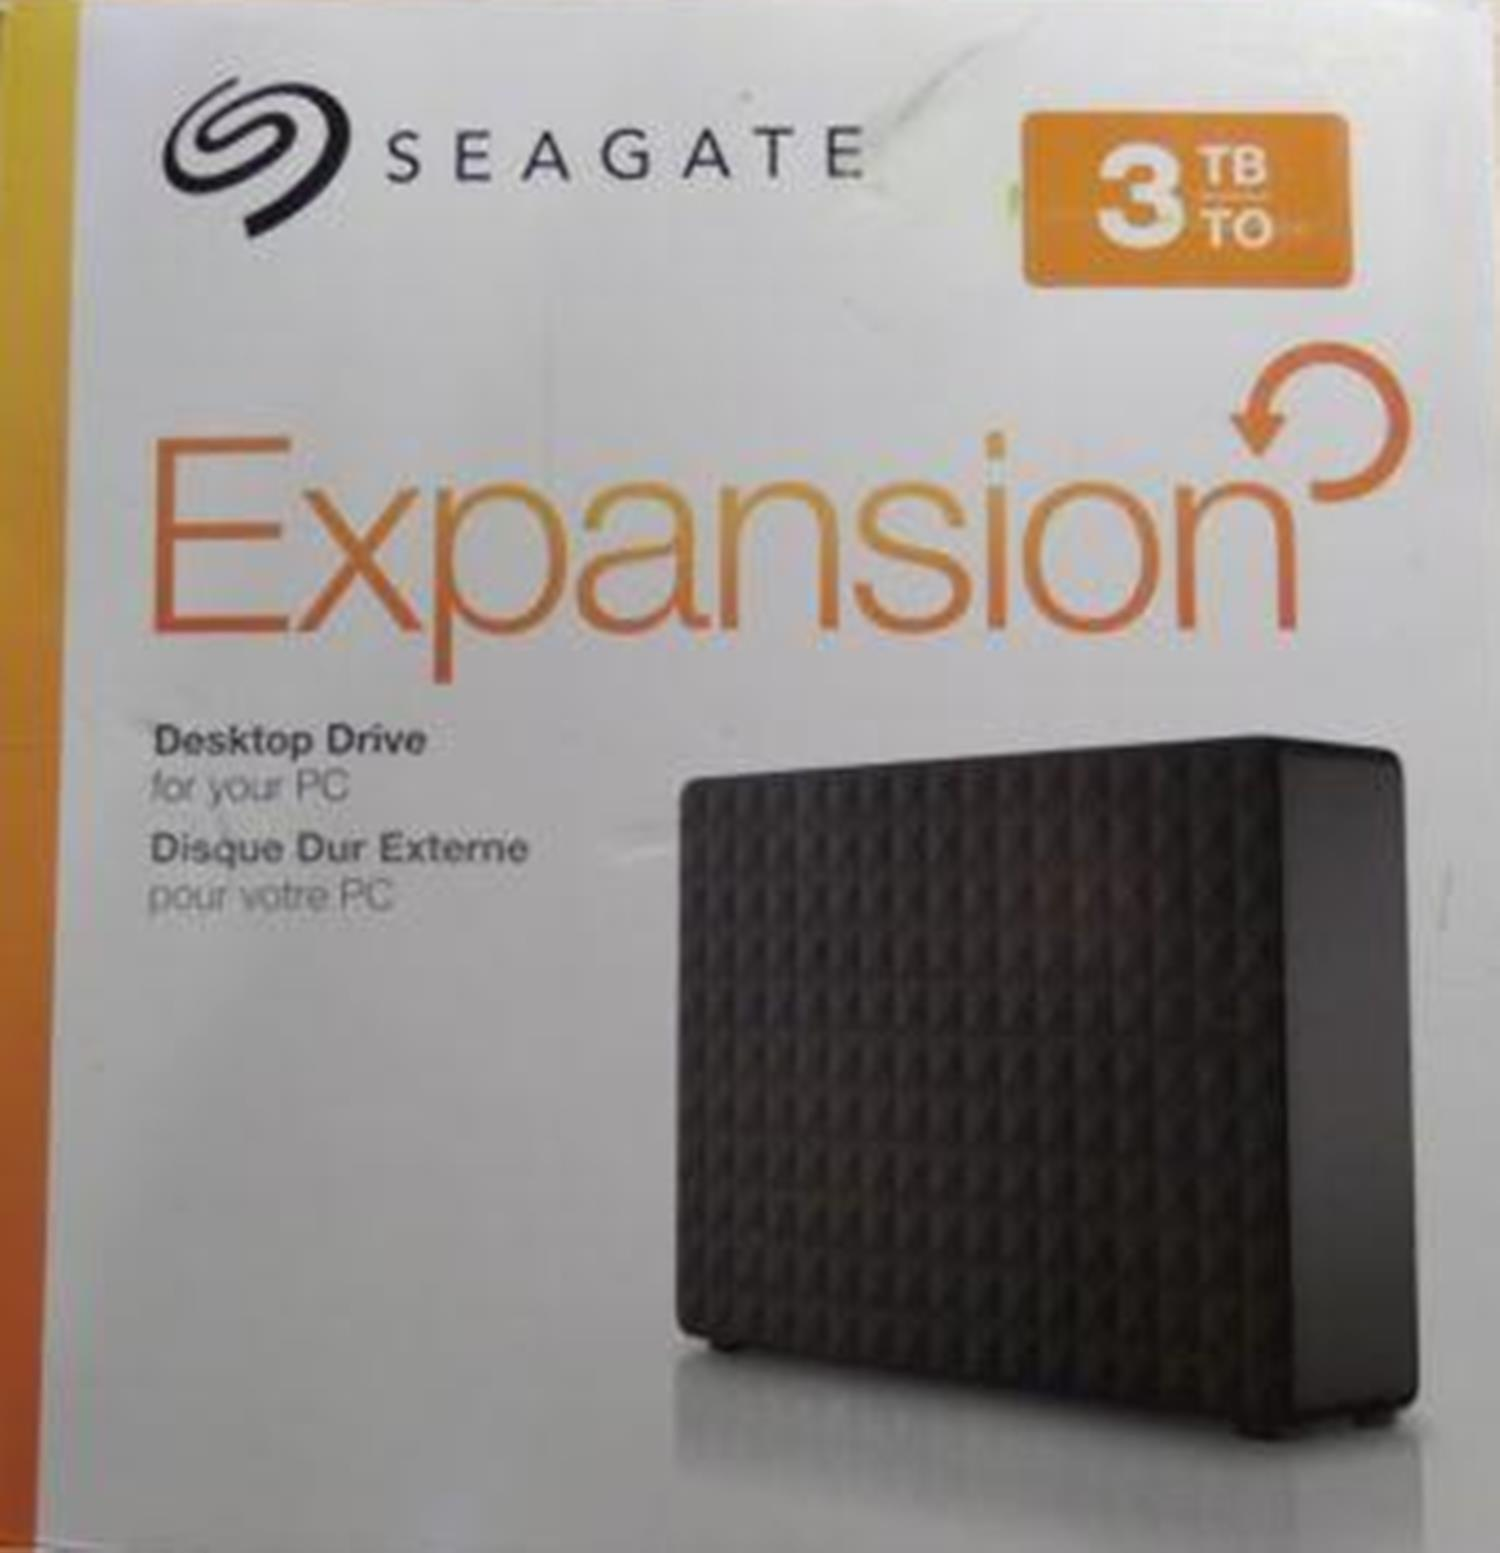 Seagate Expansion 3TB USB 3.0 Desktop External Hard Drive STEB3000100 Black